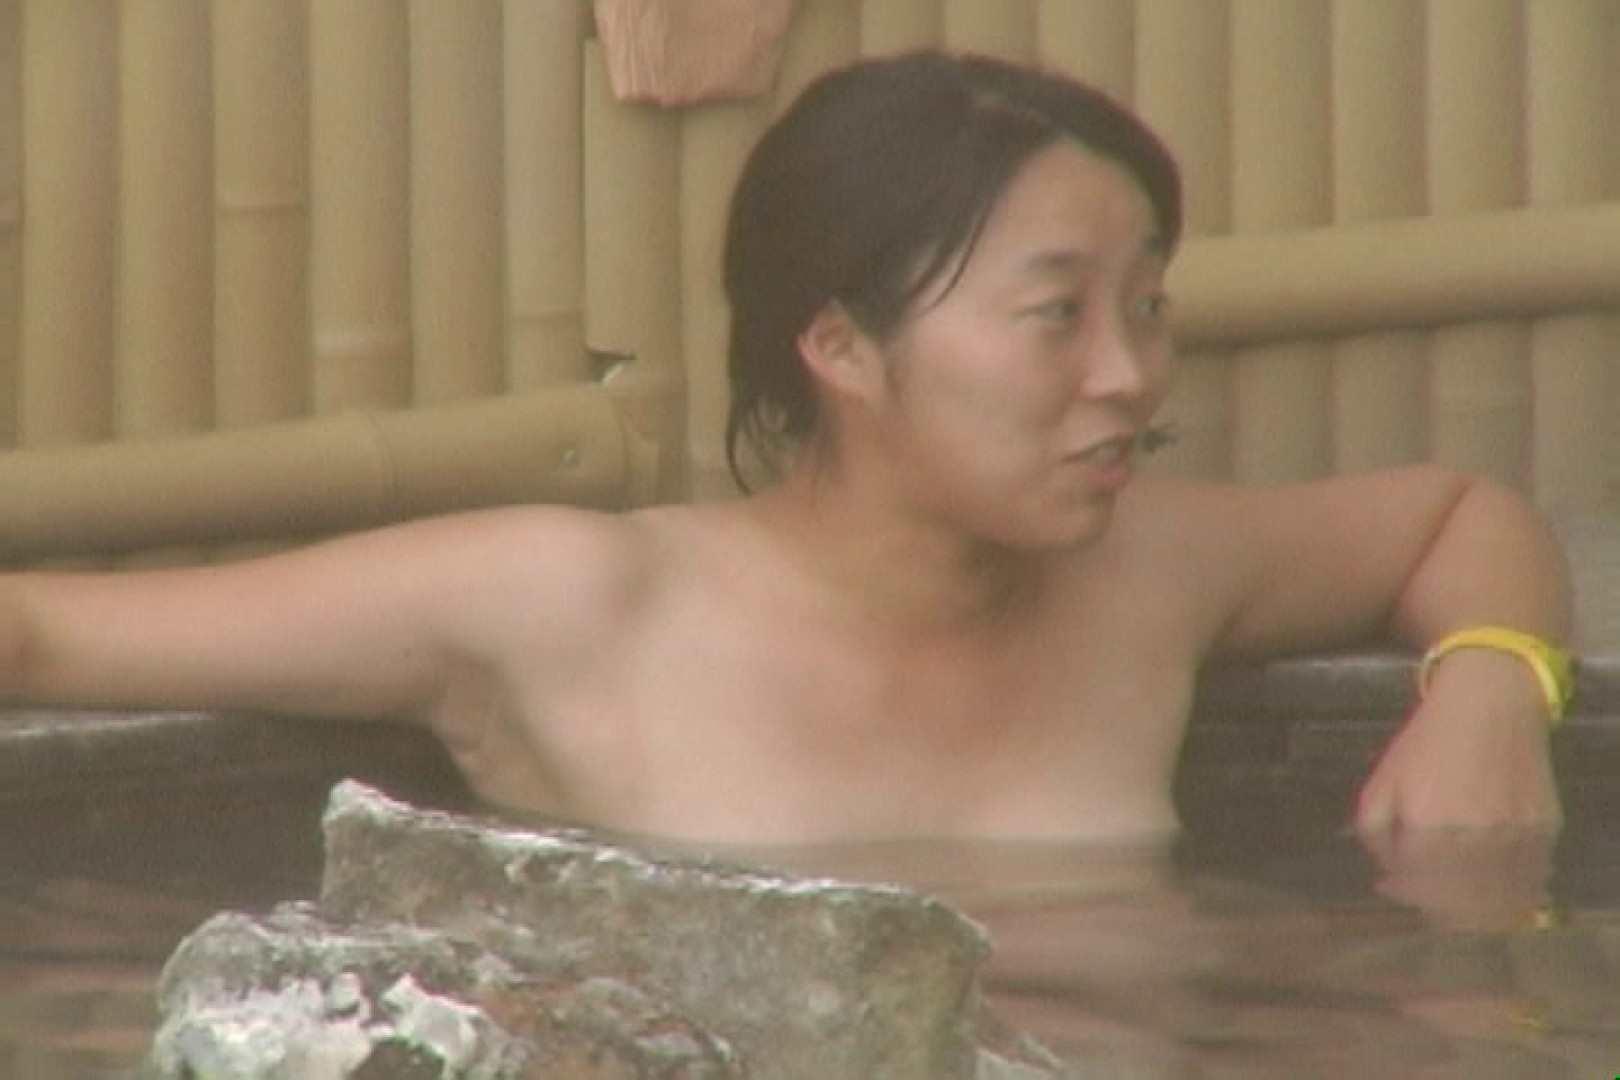 Aquaな露天風呂Vol.26【VIP】 OLセックス 盗み撮りオマンコ動画キャプチャ 59画像 23